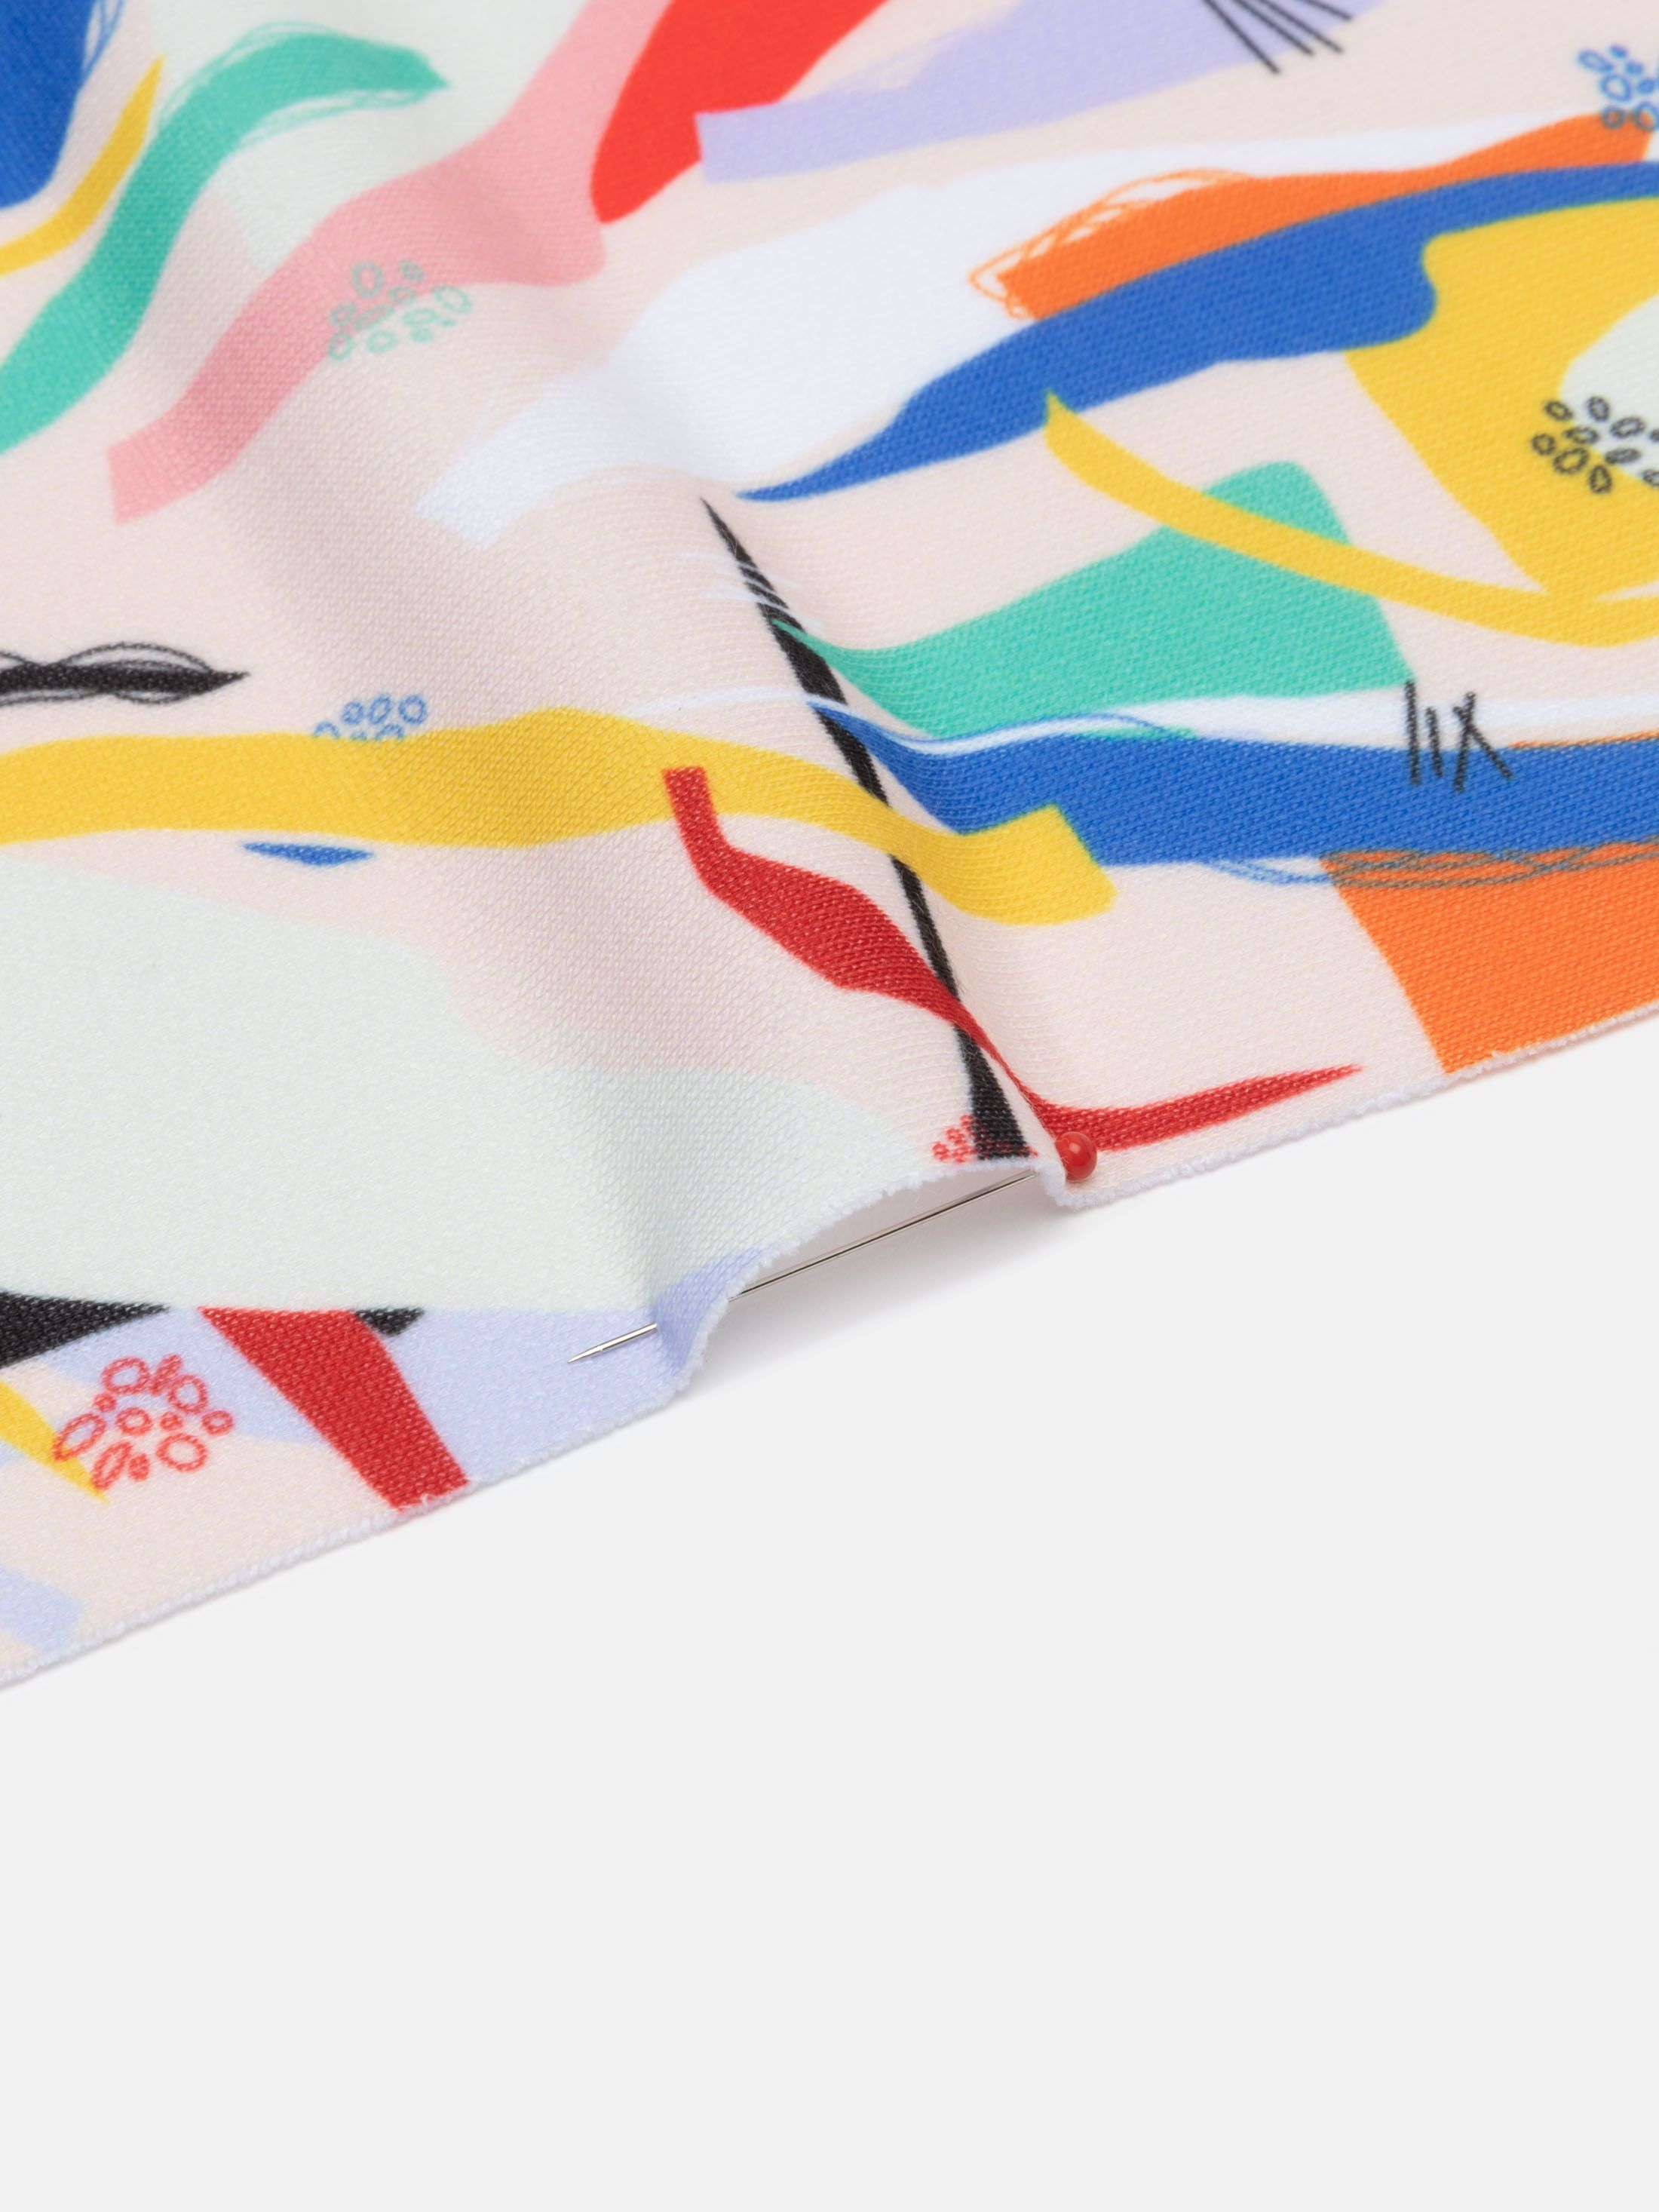 stampa sublimatica su tessuto felpa